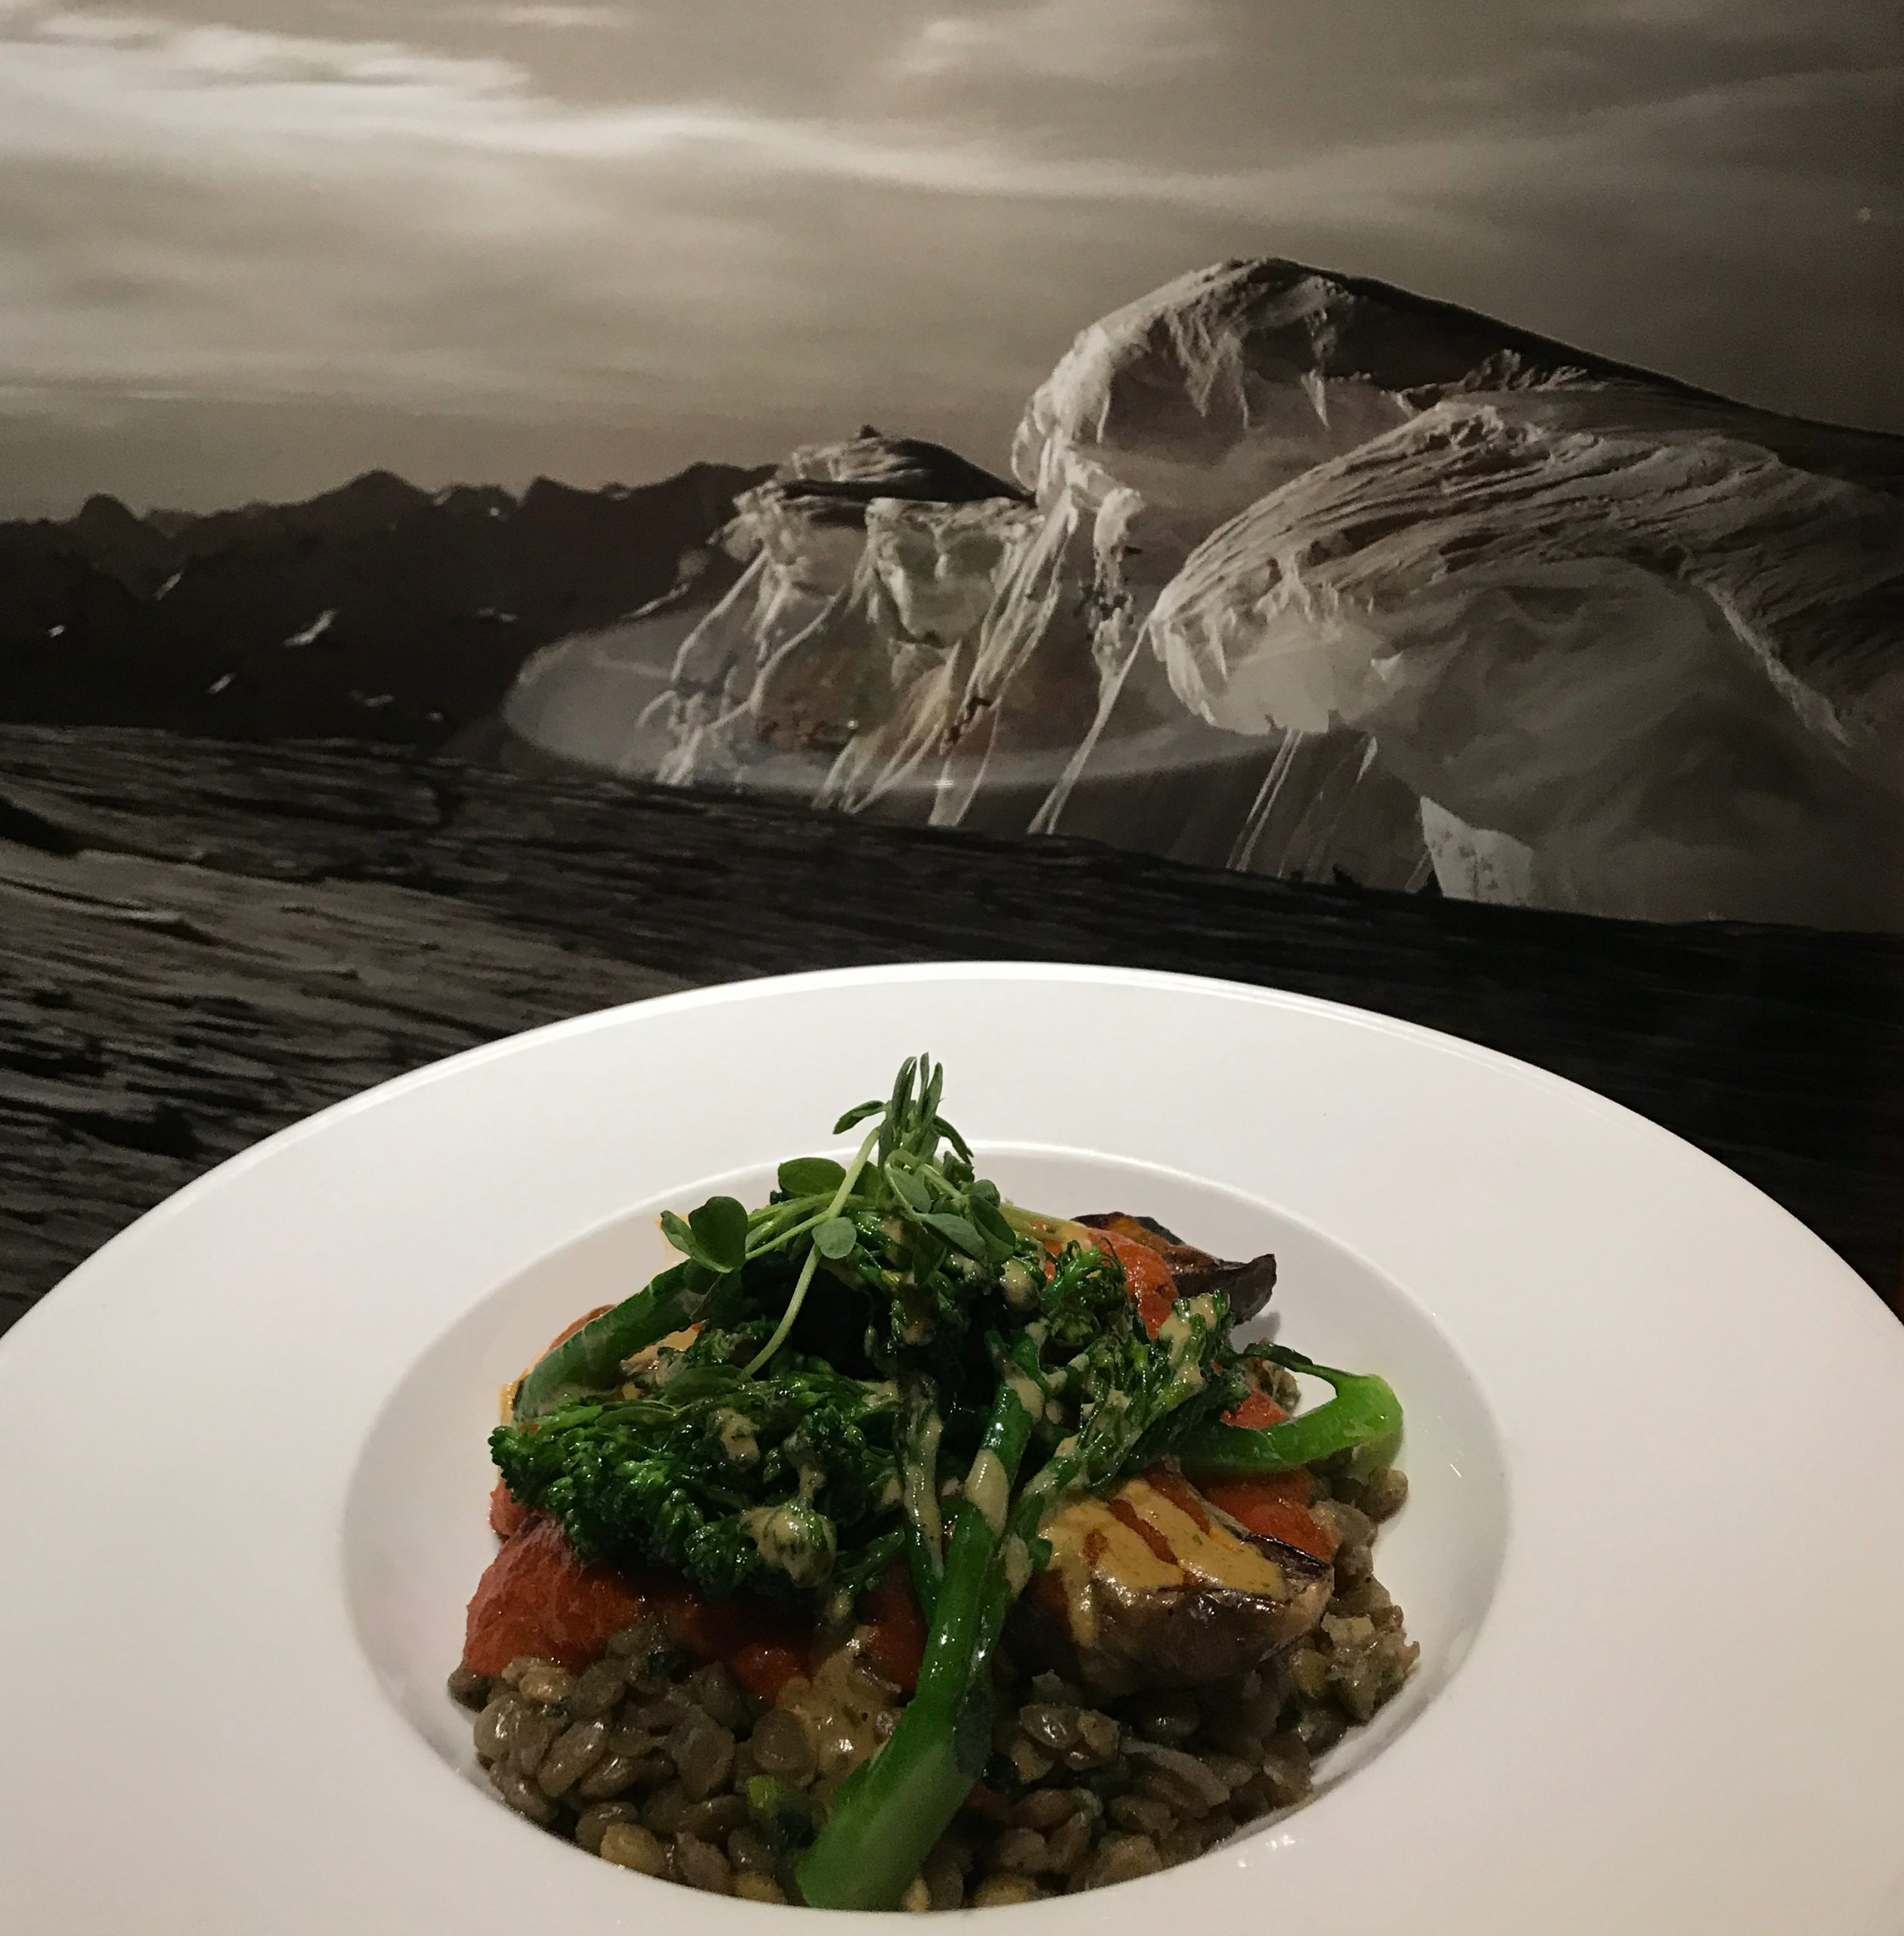 Kingfisher Restaurant - Eggplant